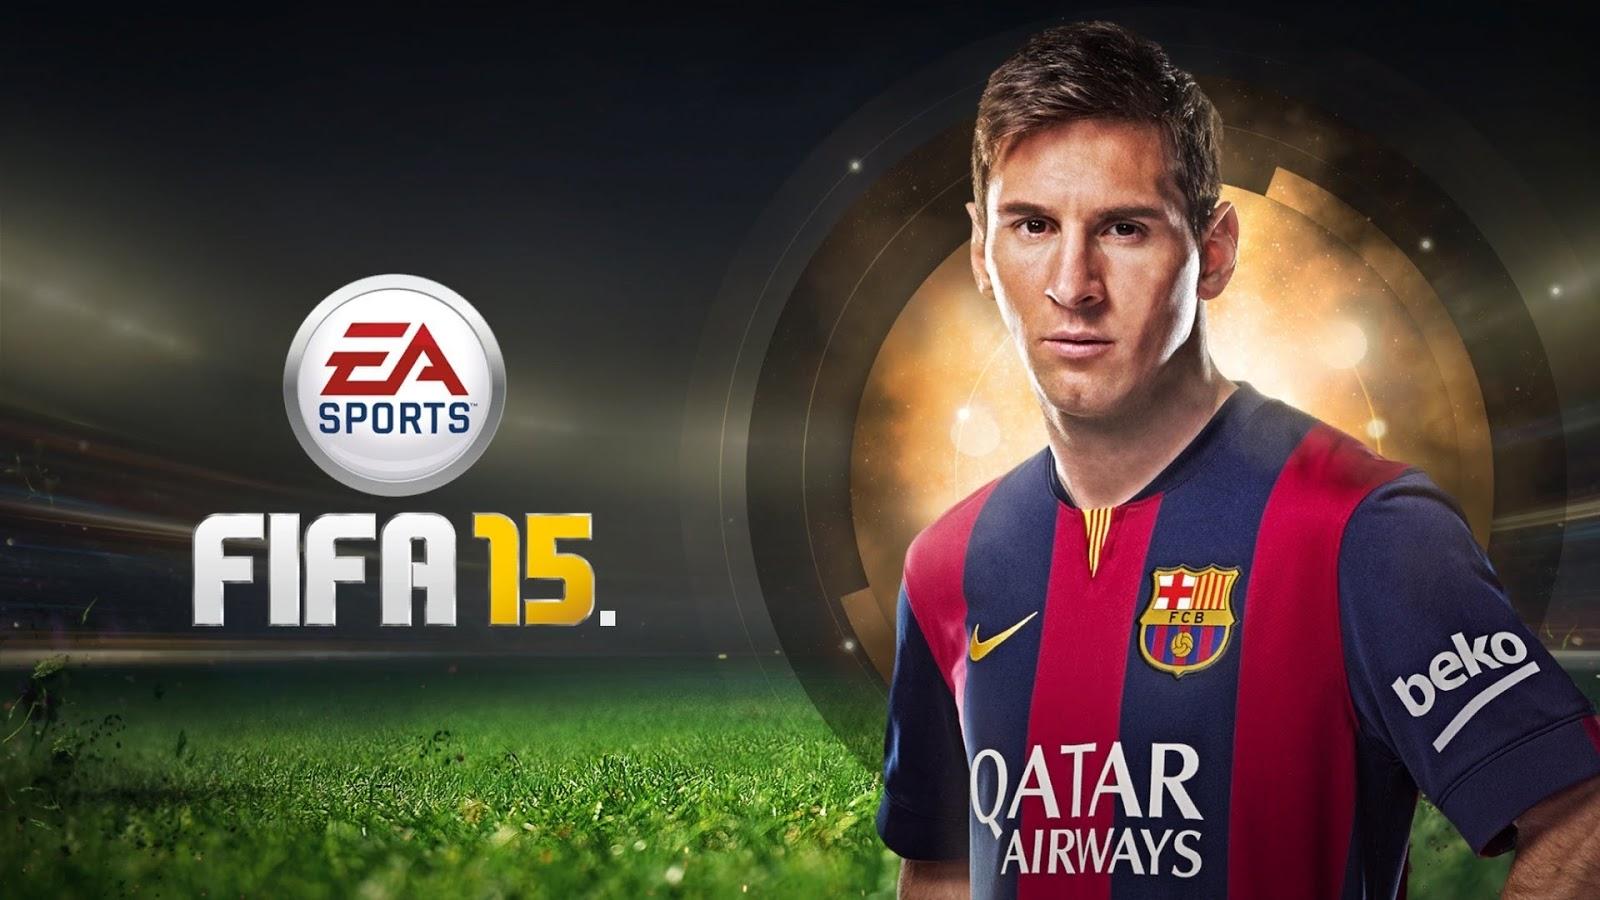 FIFA 15 Crack Latest 2016 Full Version